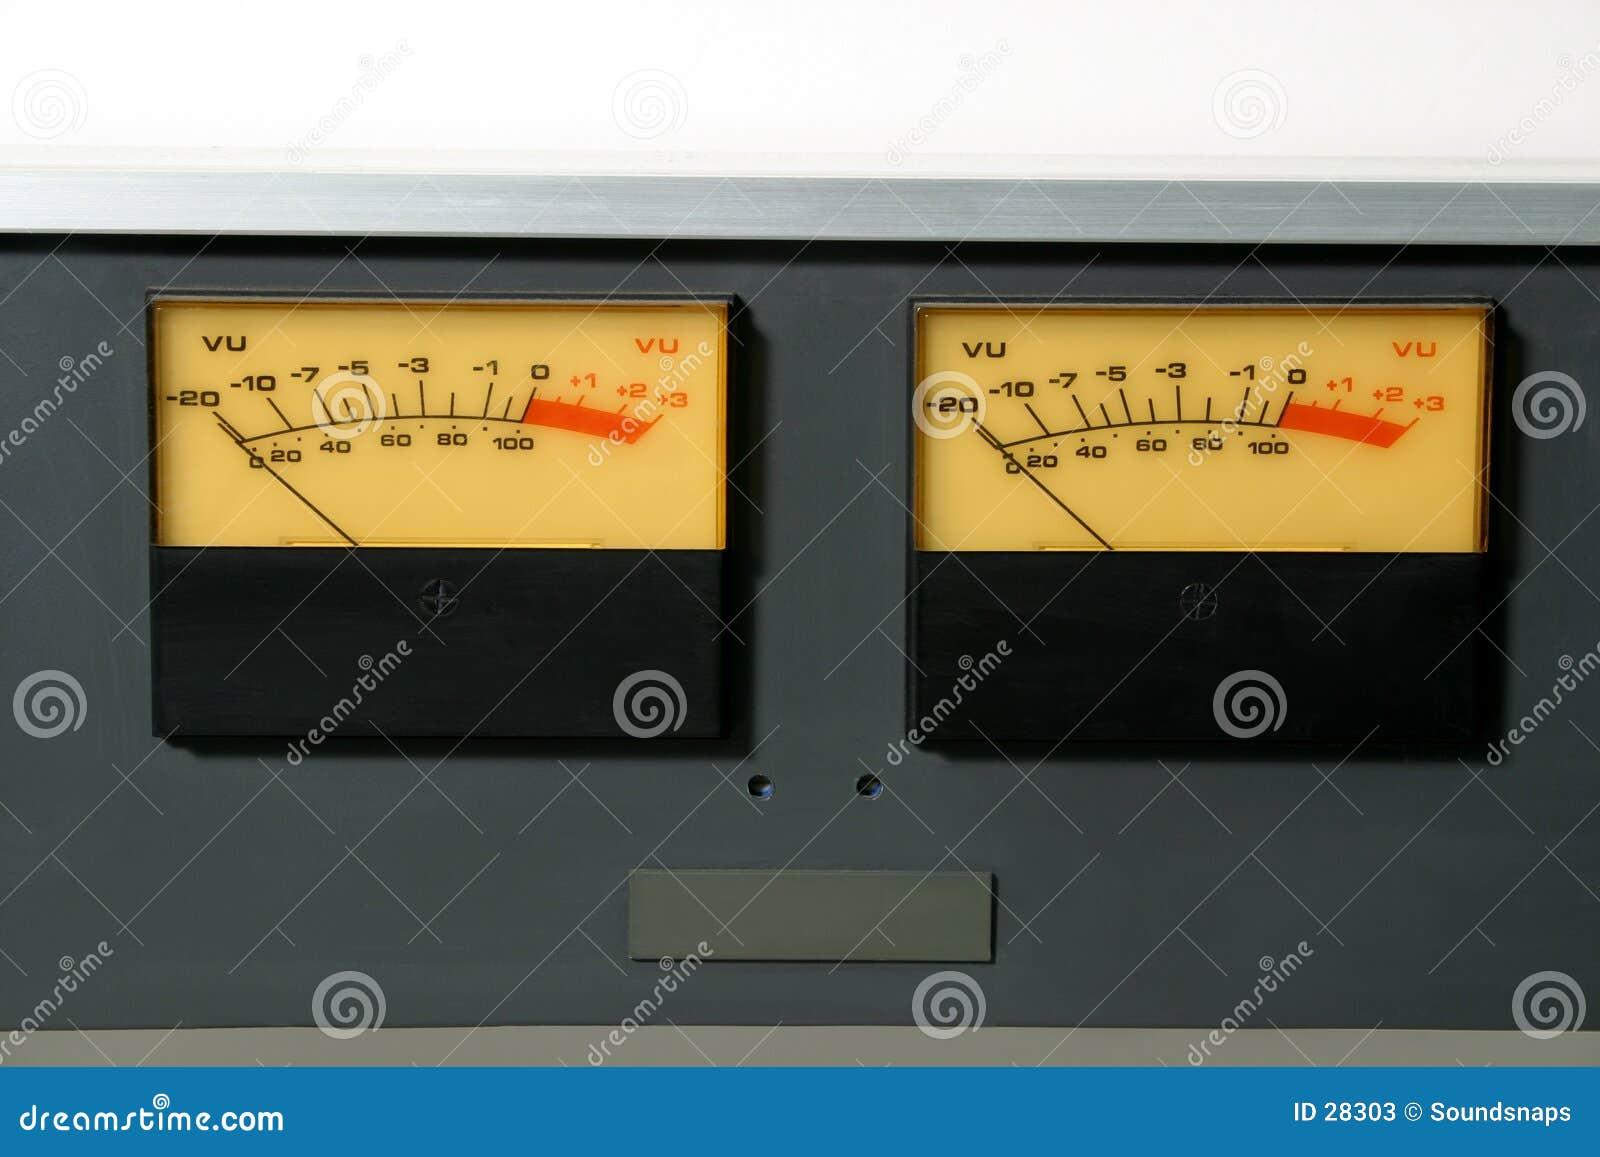 Stereowaagerecht ausgerichtete Audiomeßinstrumente